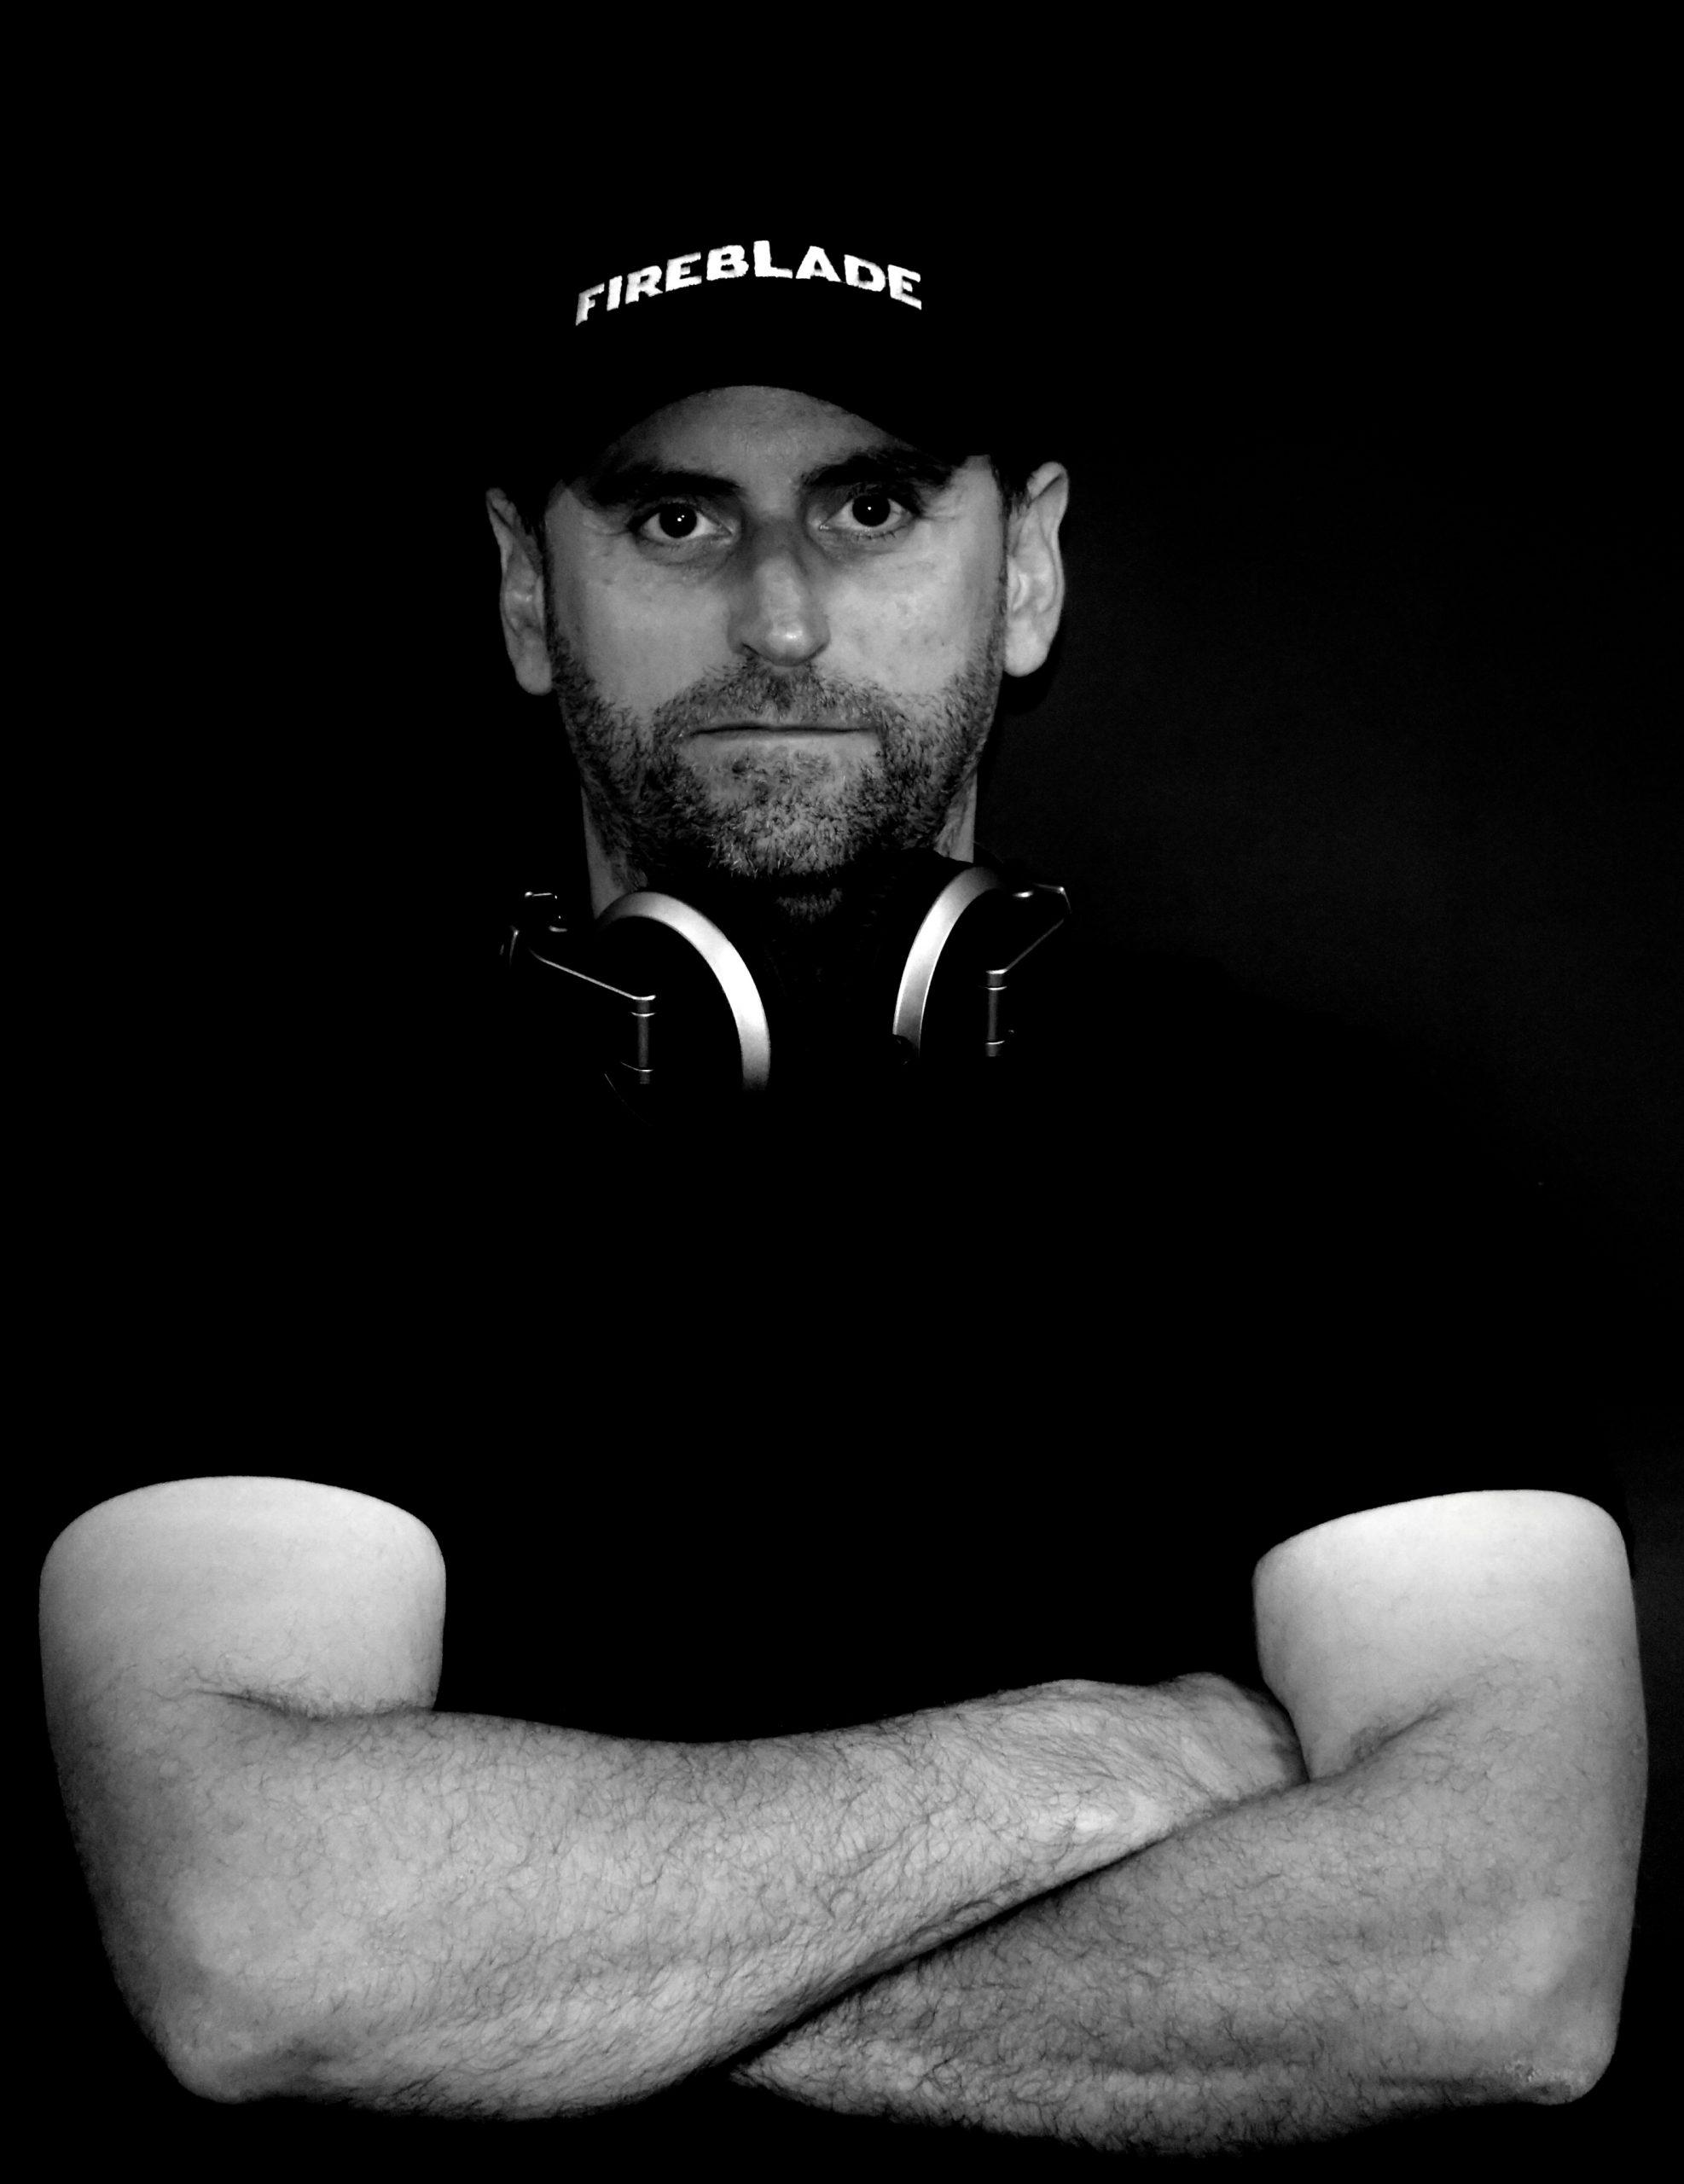 DJ Fireblade